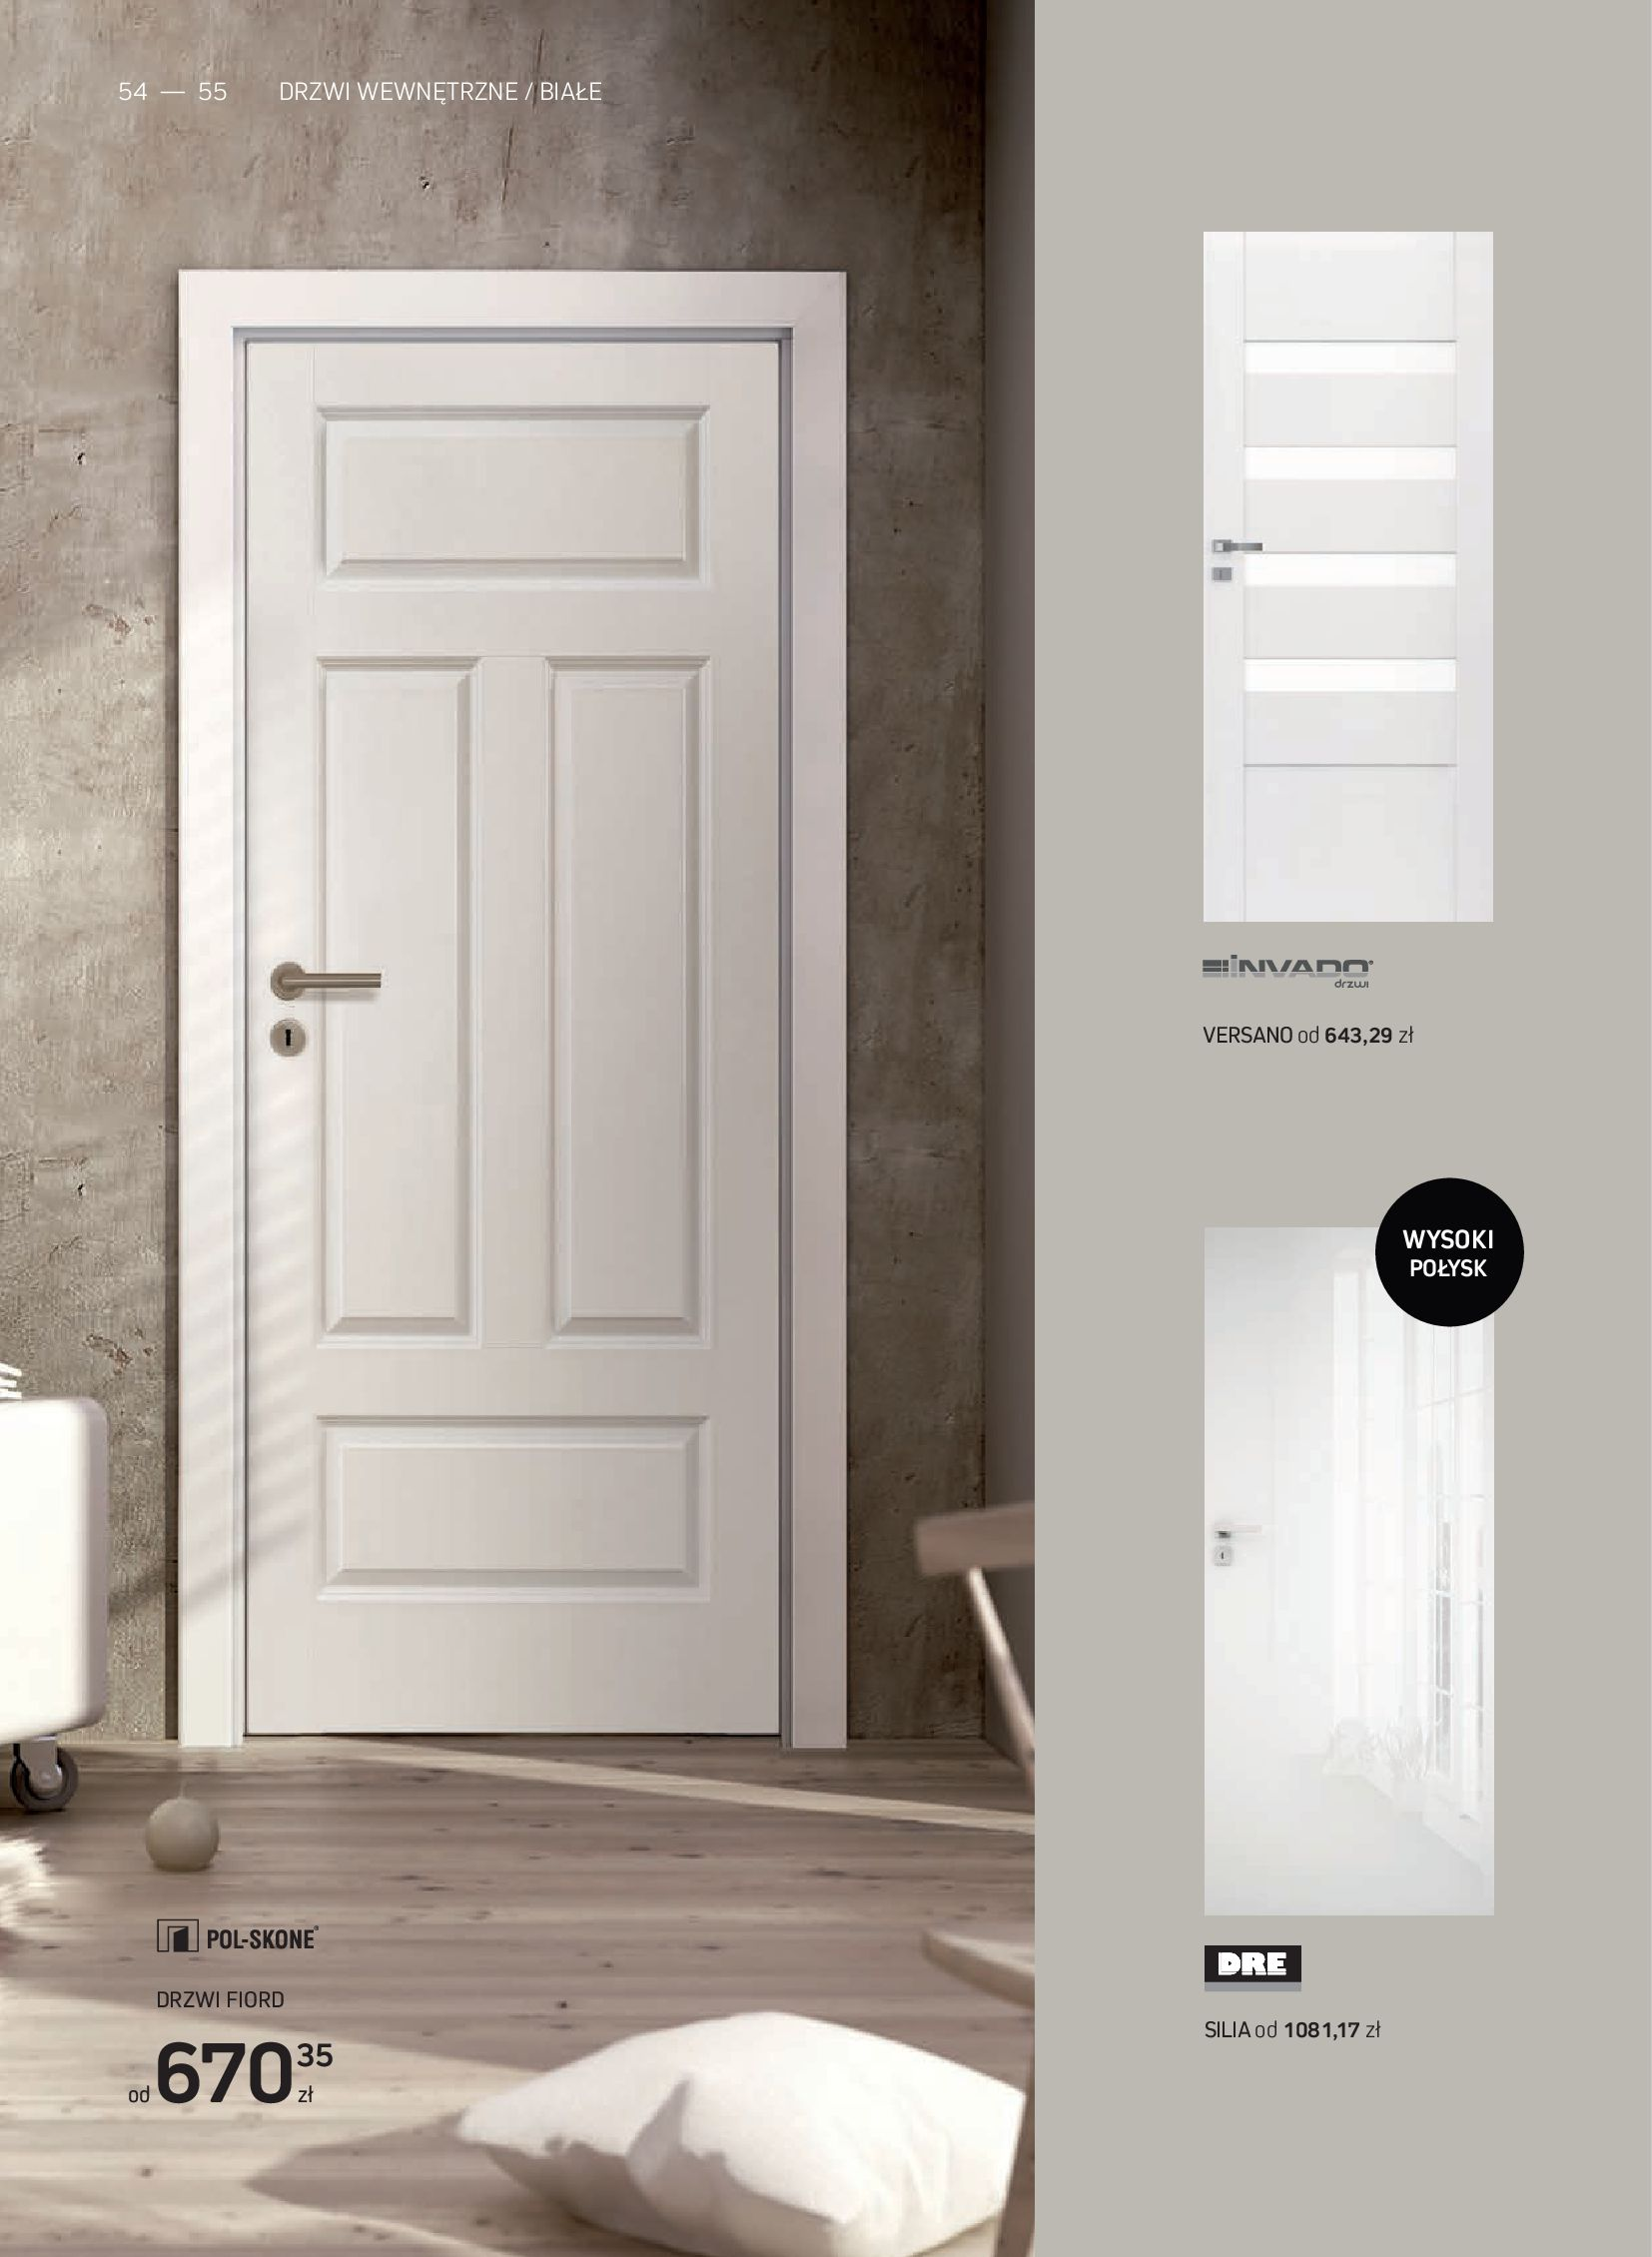 Gazetka Komfort: Gazetka Komfort - Katalog podłogi i drzwi 2021-06-16 page-54